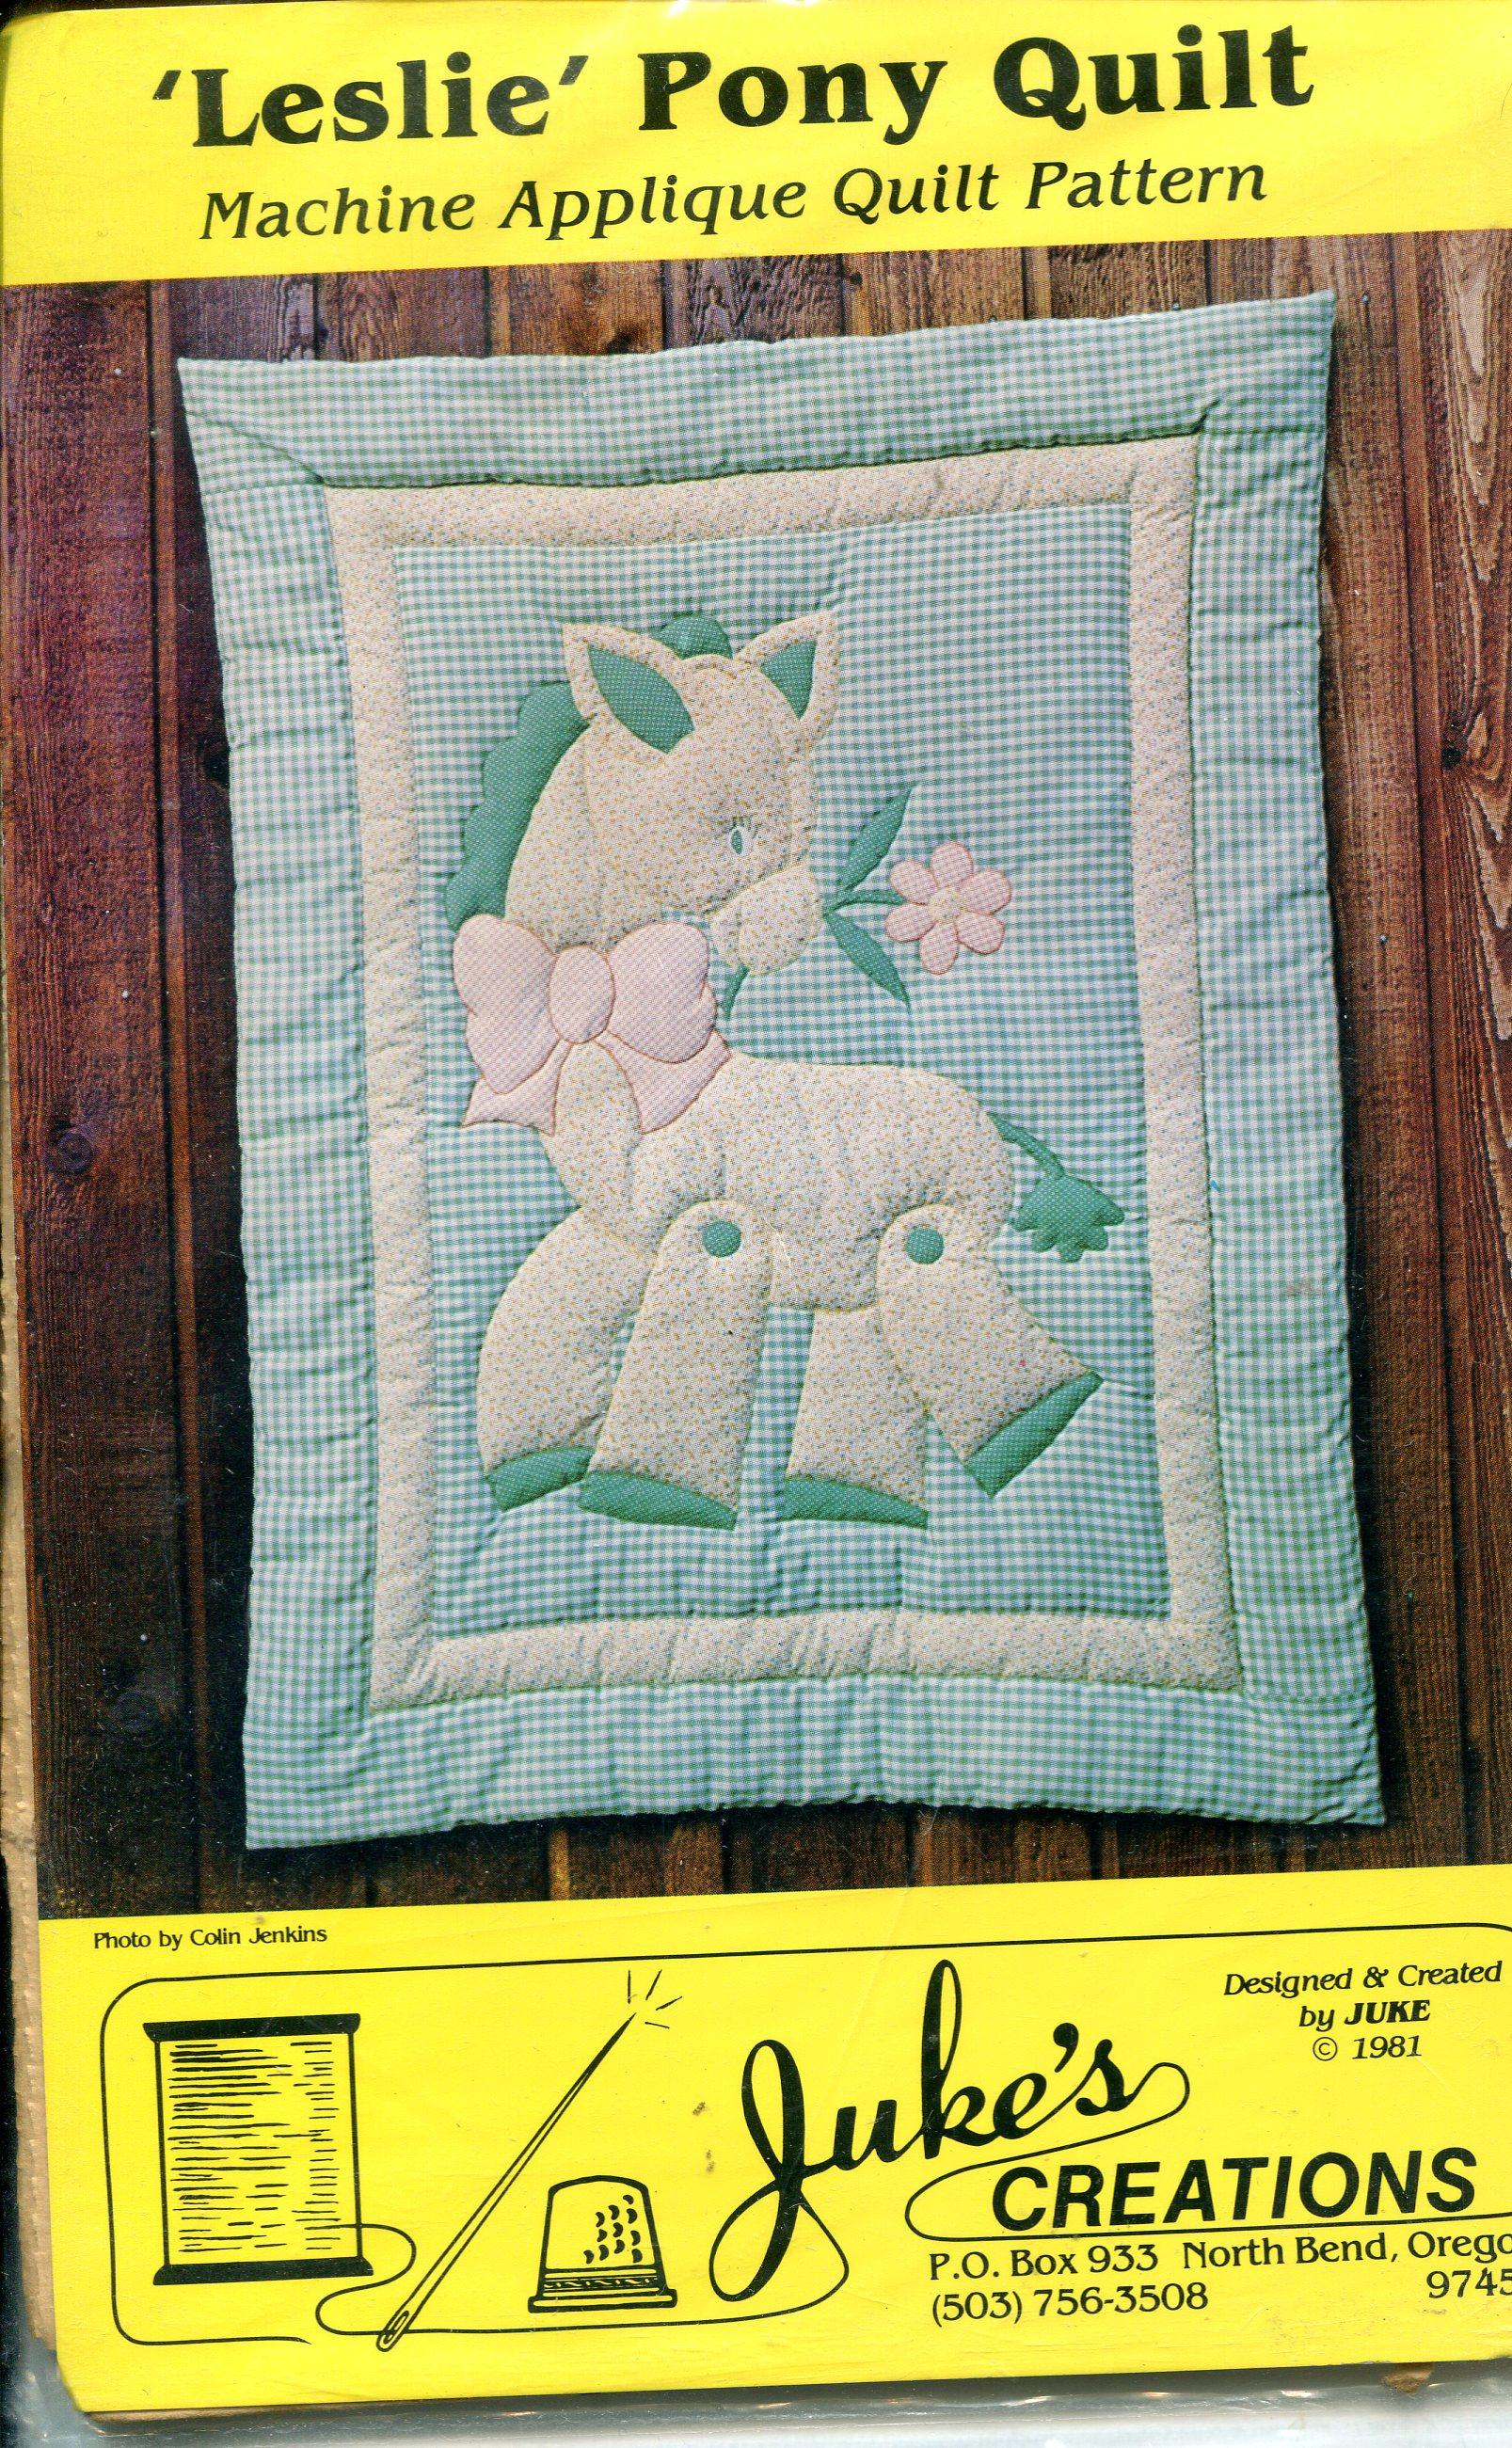 Juke's Creations Leslie Pony Quilt